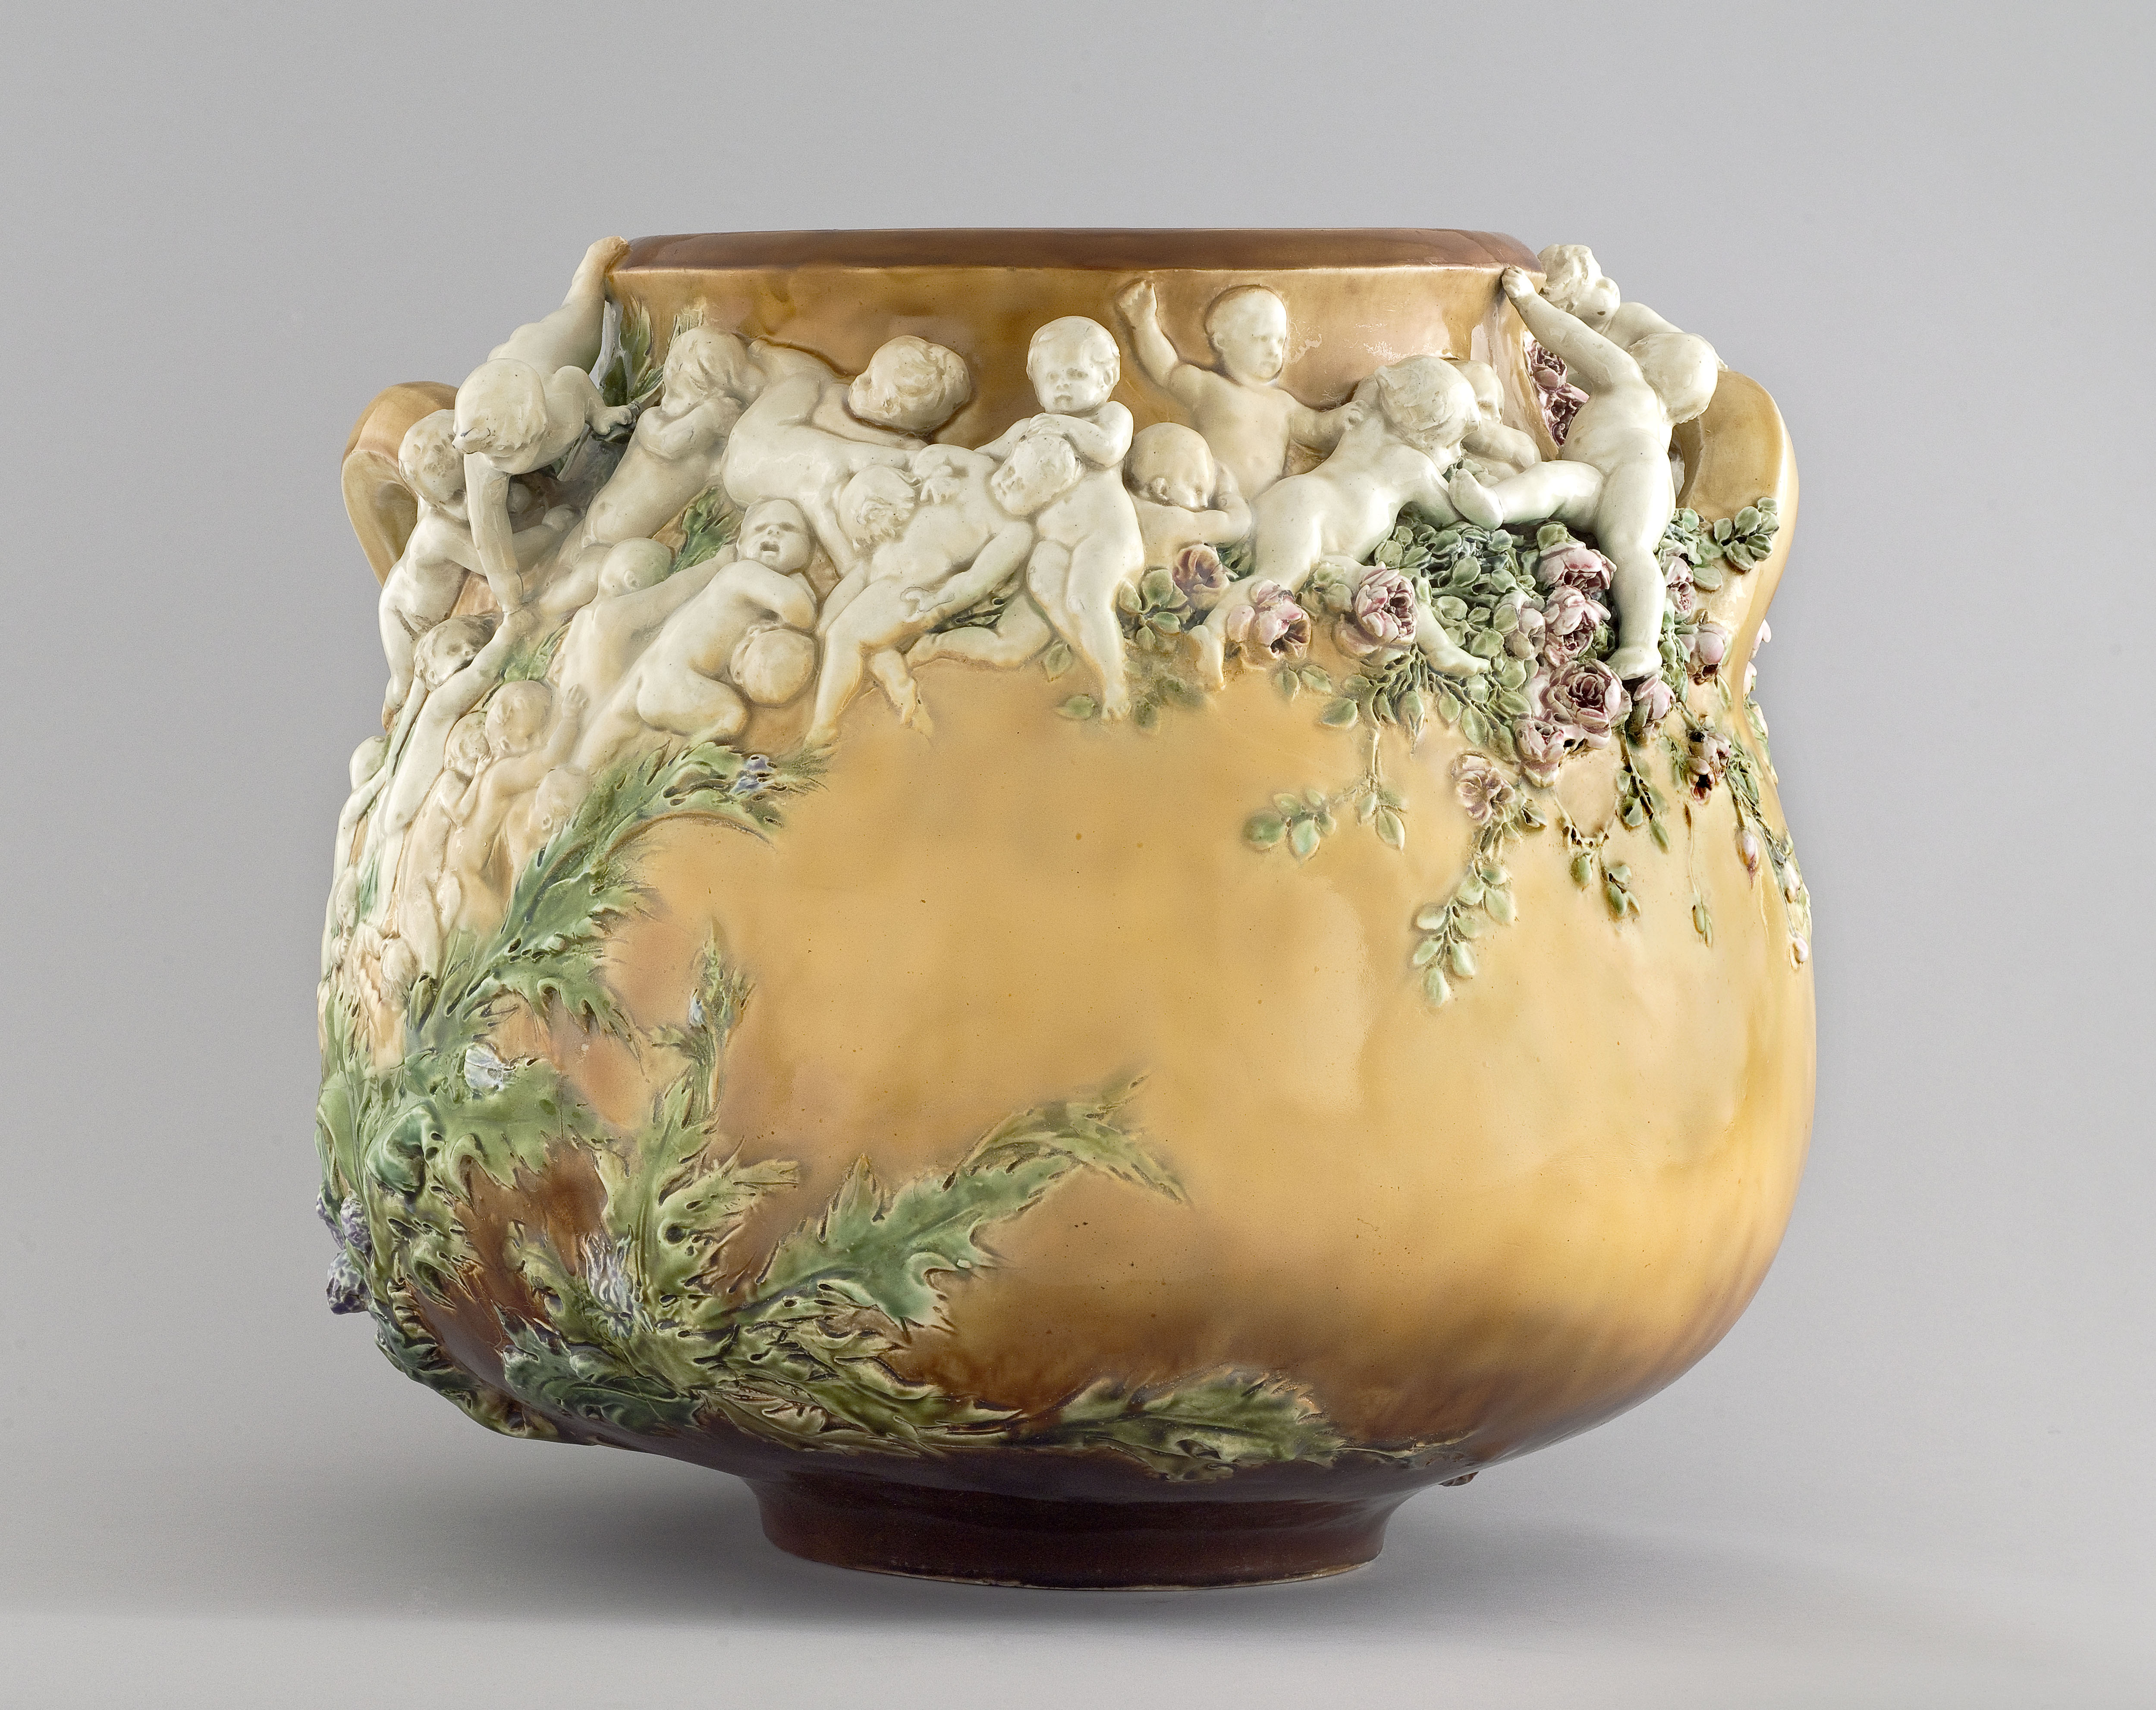 Vase - Louis-Robert Carrier-Belleuse